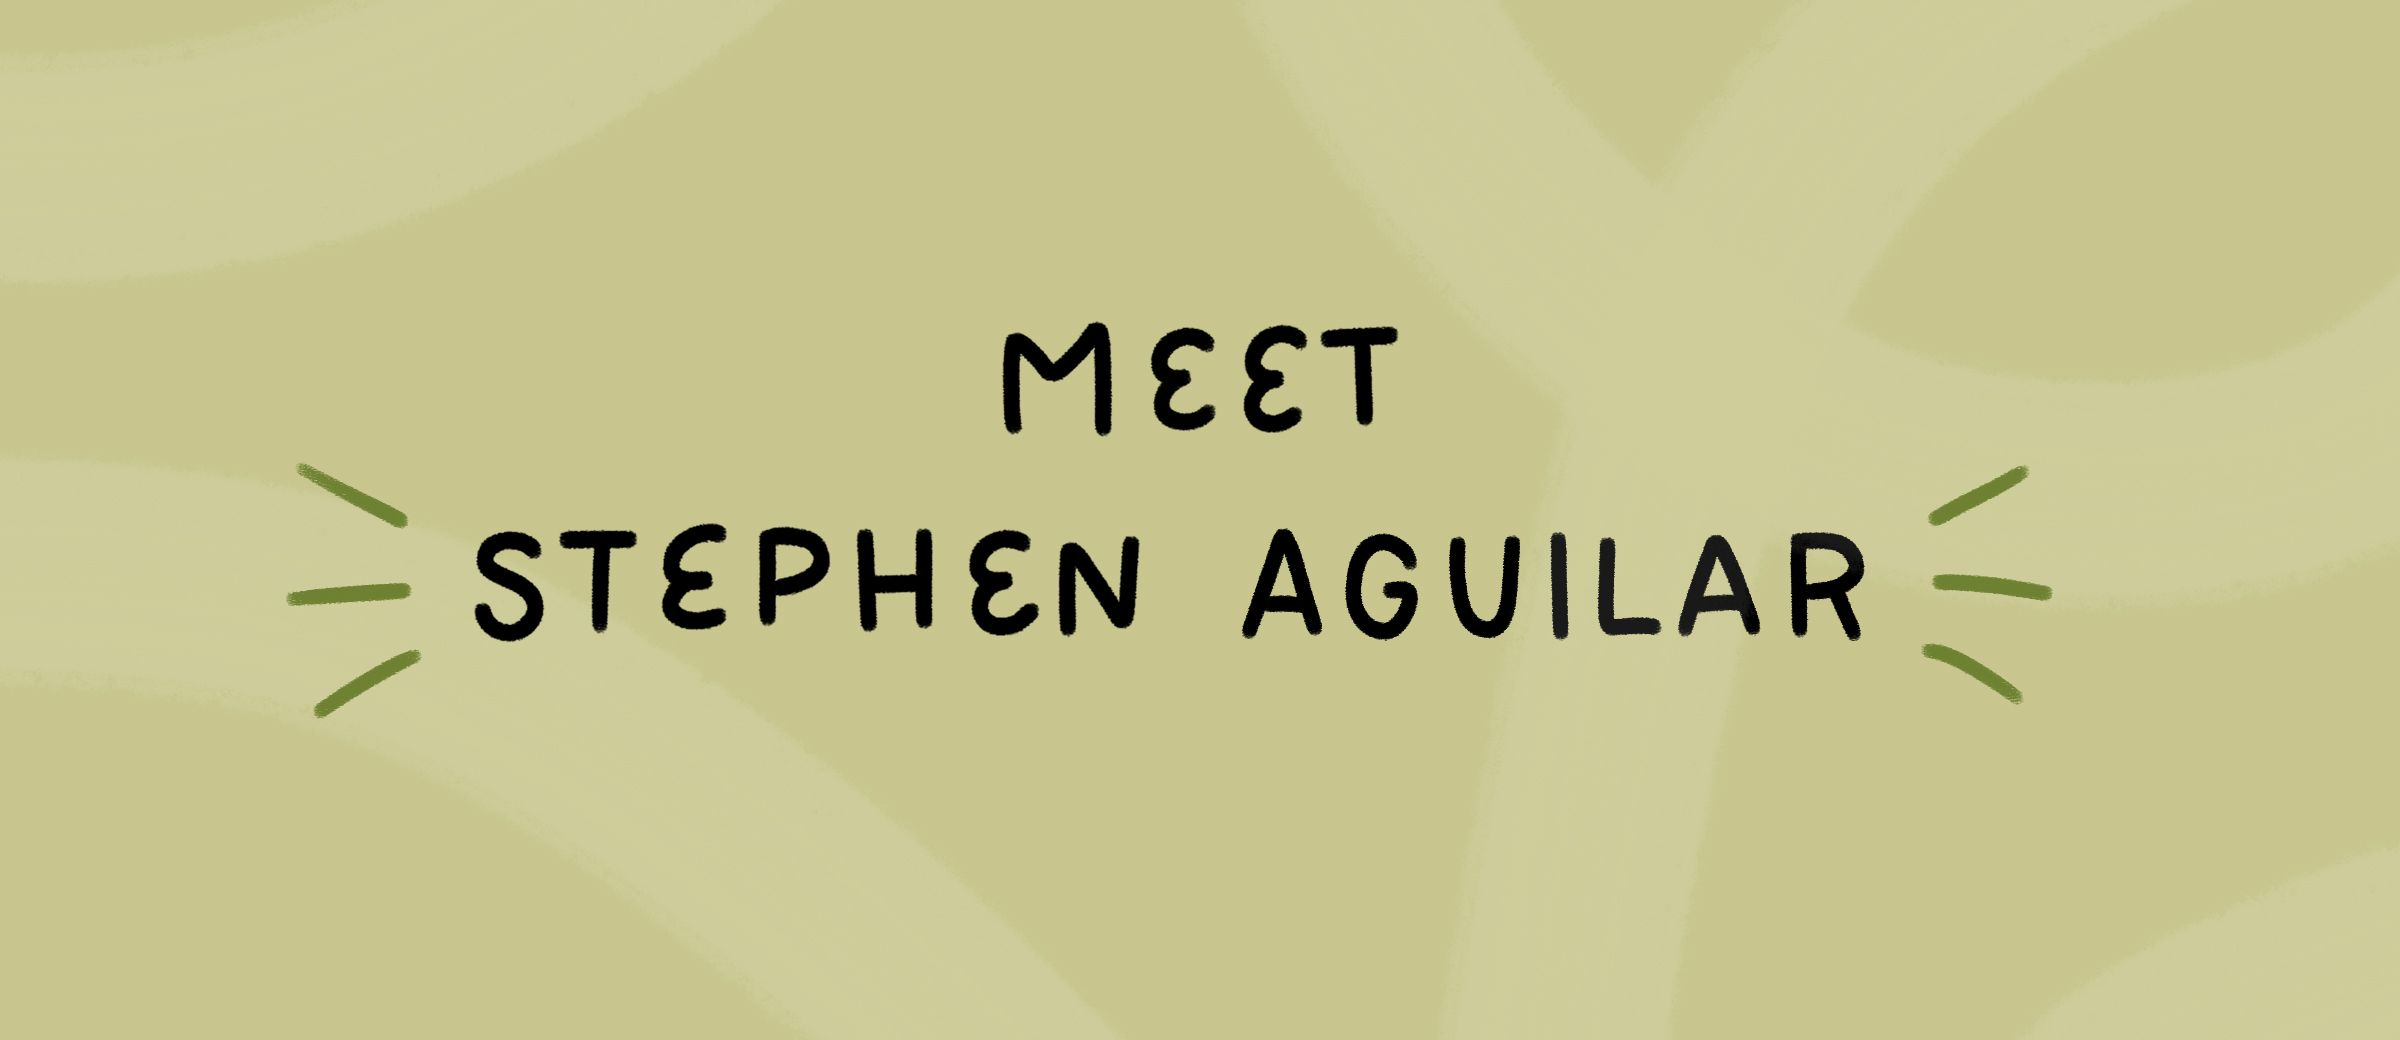 PLANOLY People: Meet Stephen Aguilar